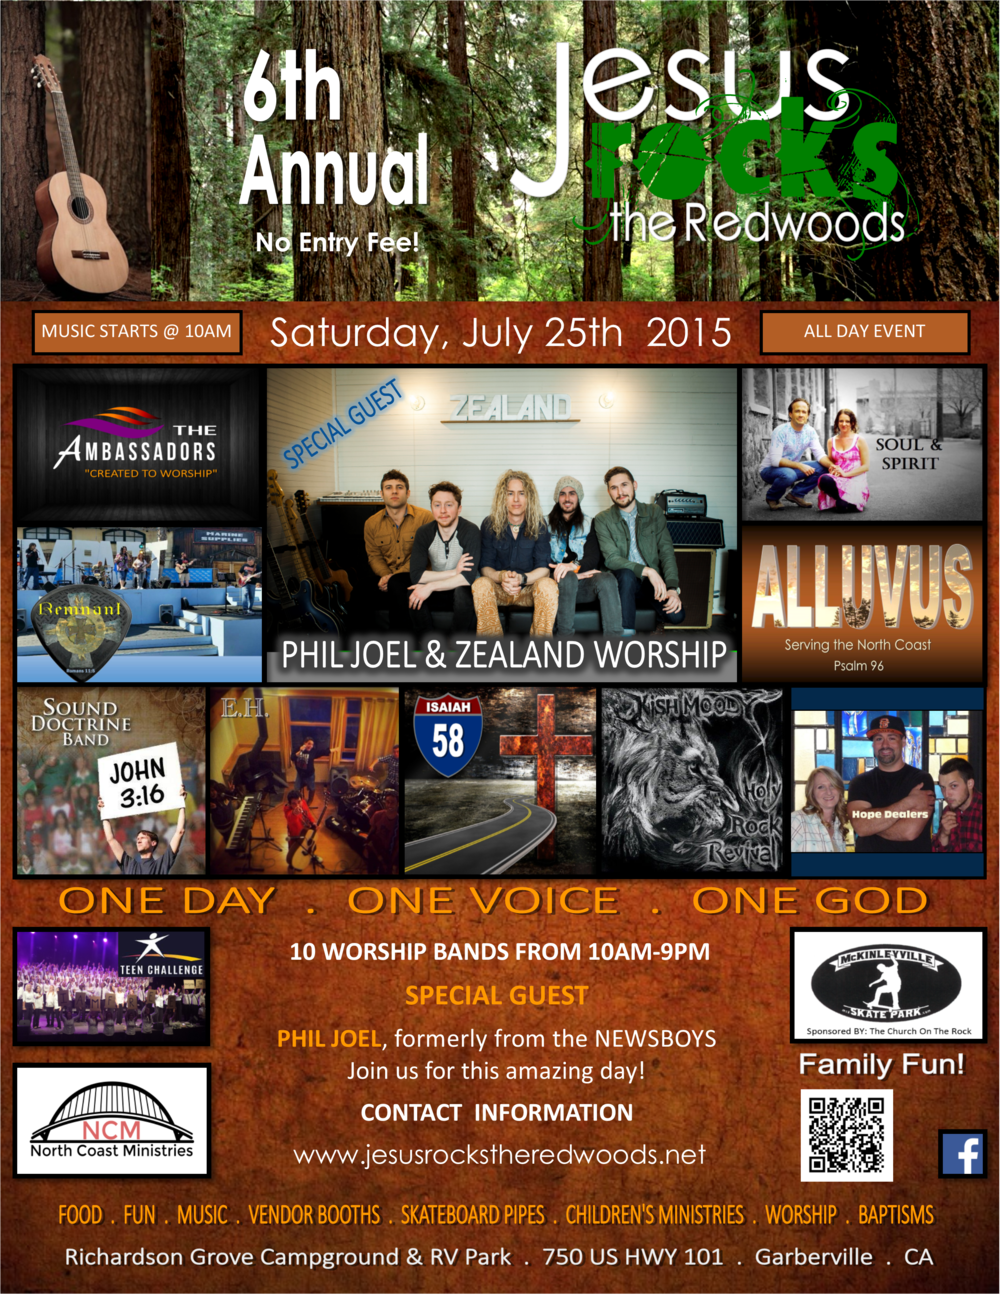 6thAnnual_JesusRocksThe Redwoods.png